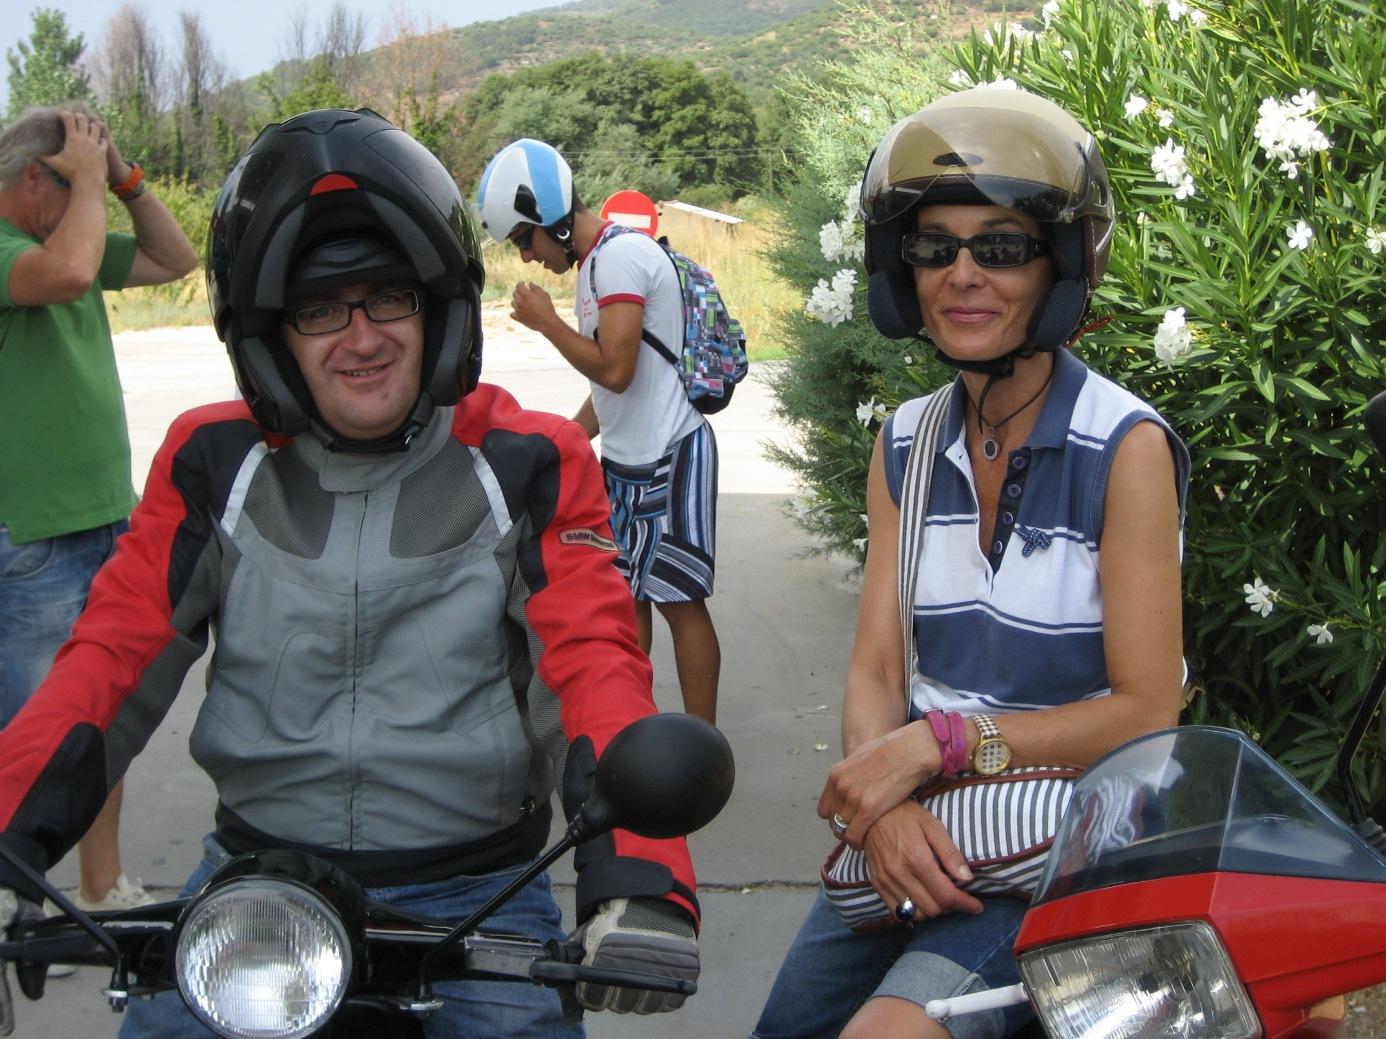 Vespasdelavera scooter club ruta espectacular a candelario for Vater ecologico